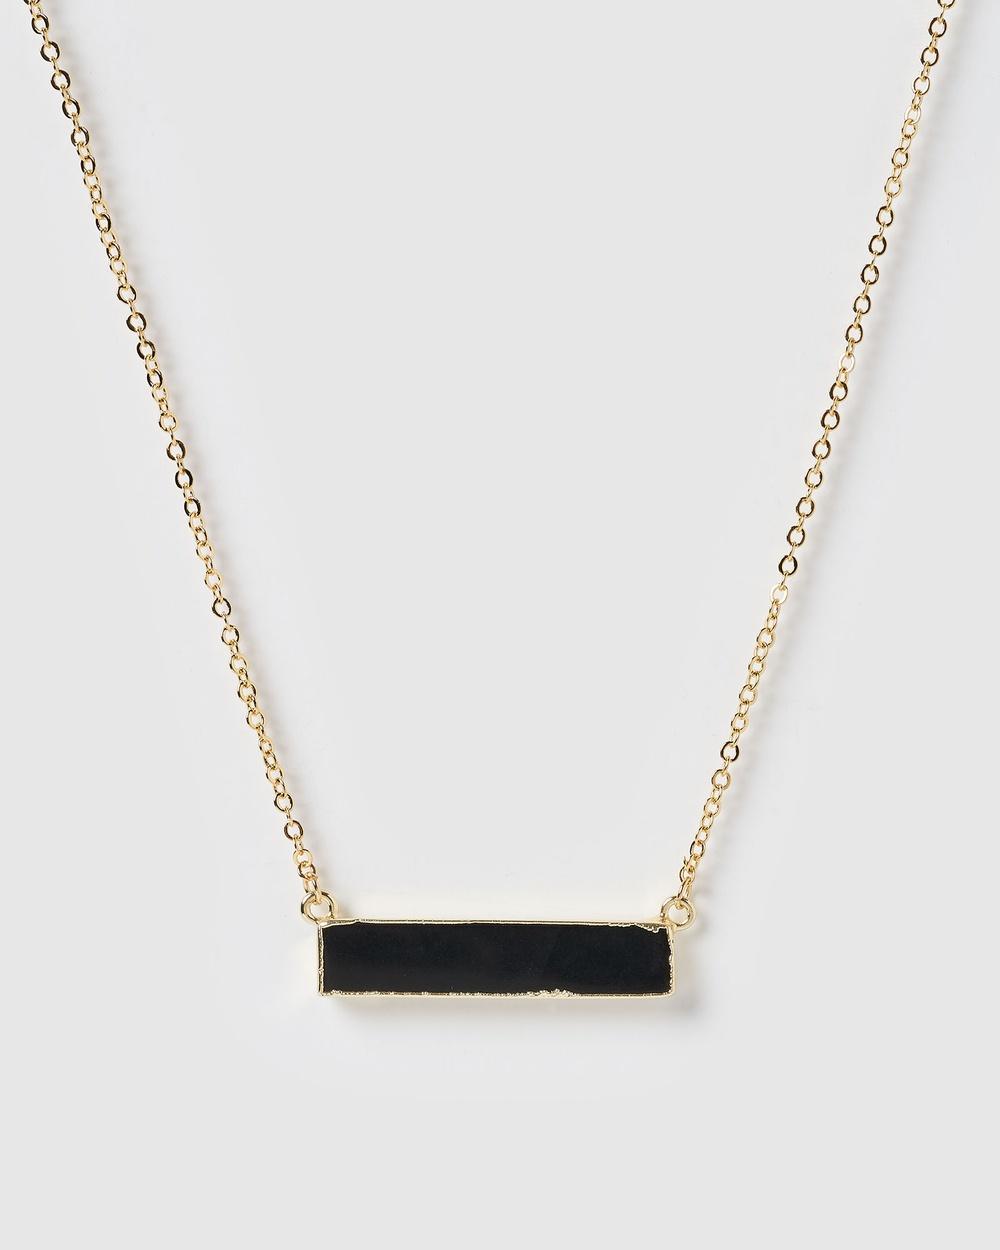 Miz Casa and Co Rylee Pendant Necklace Jewellery Black Onyx Gold